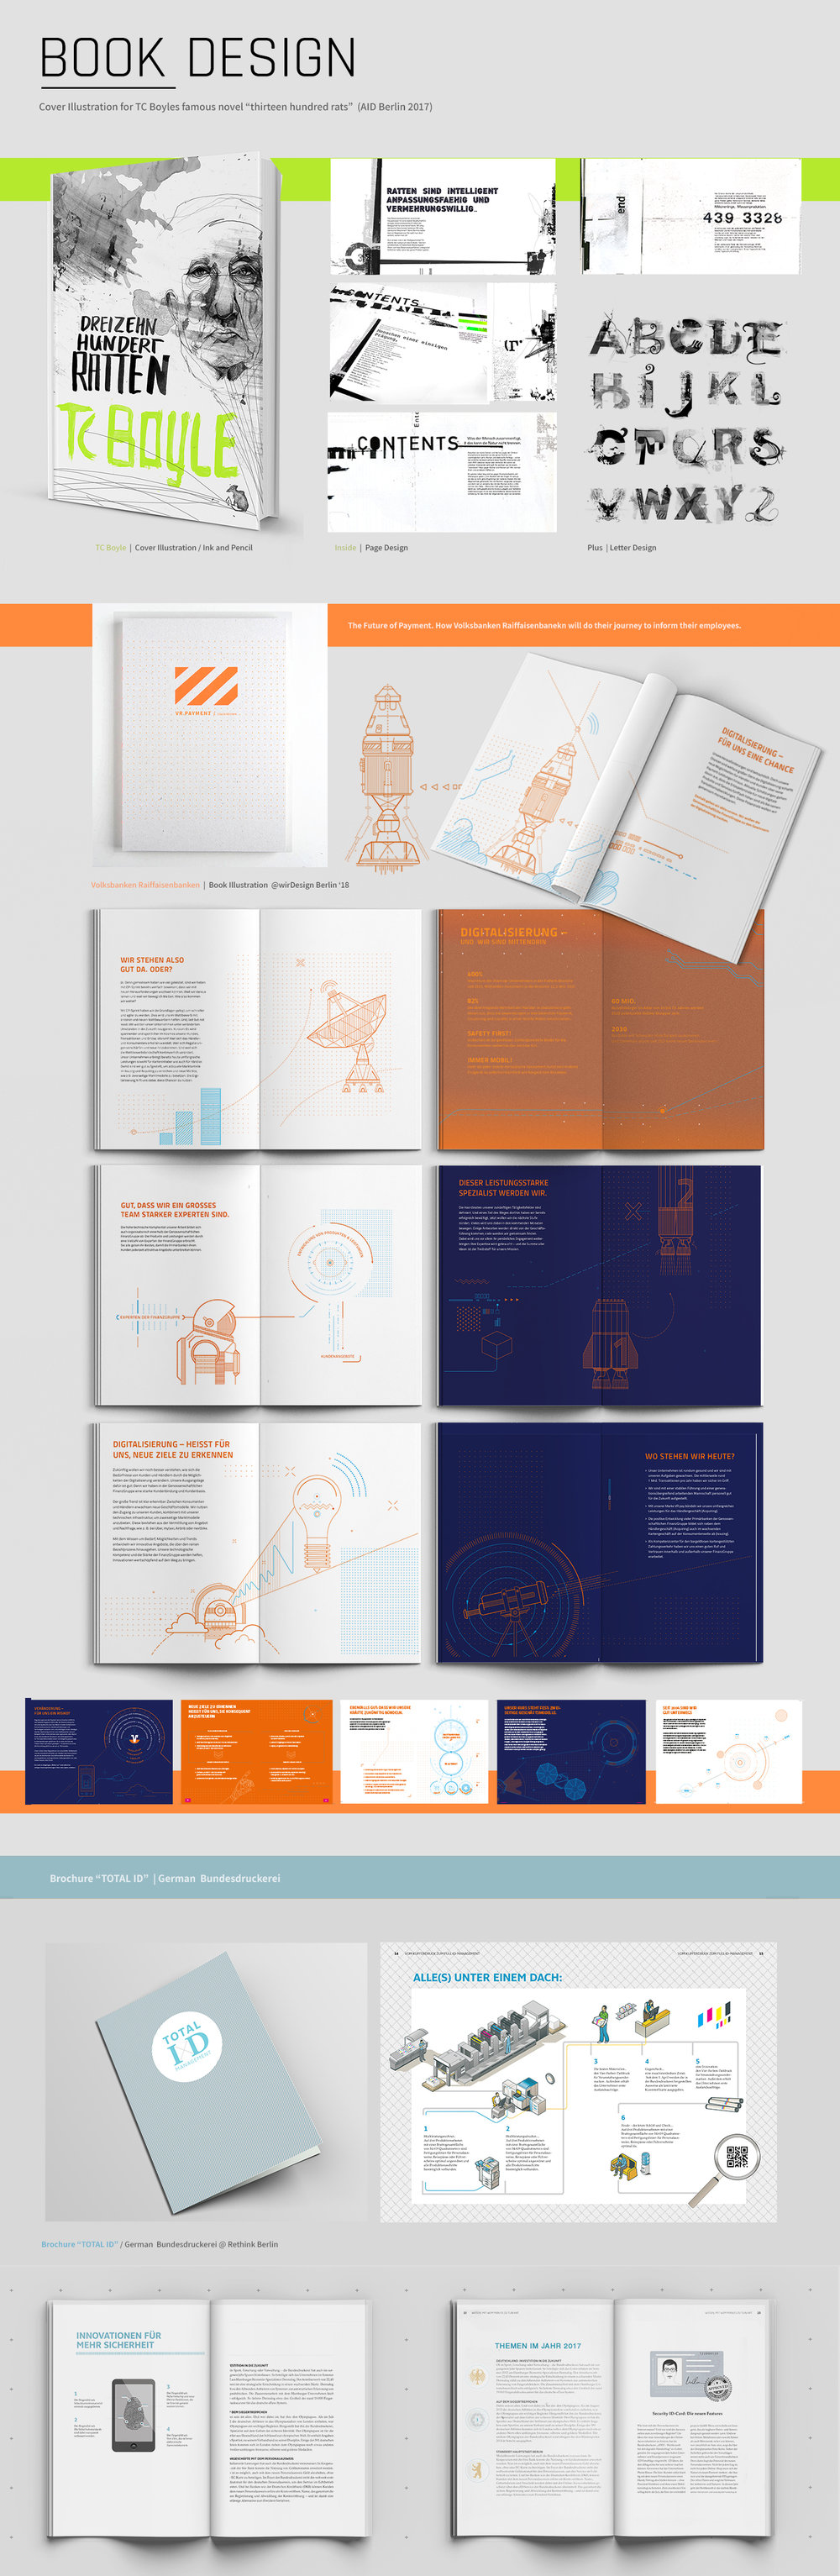 Print_Case.jpg